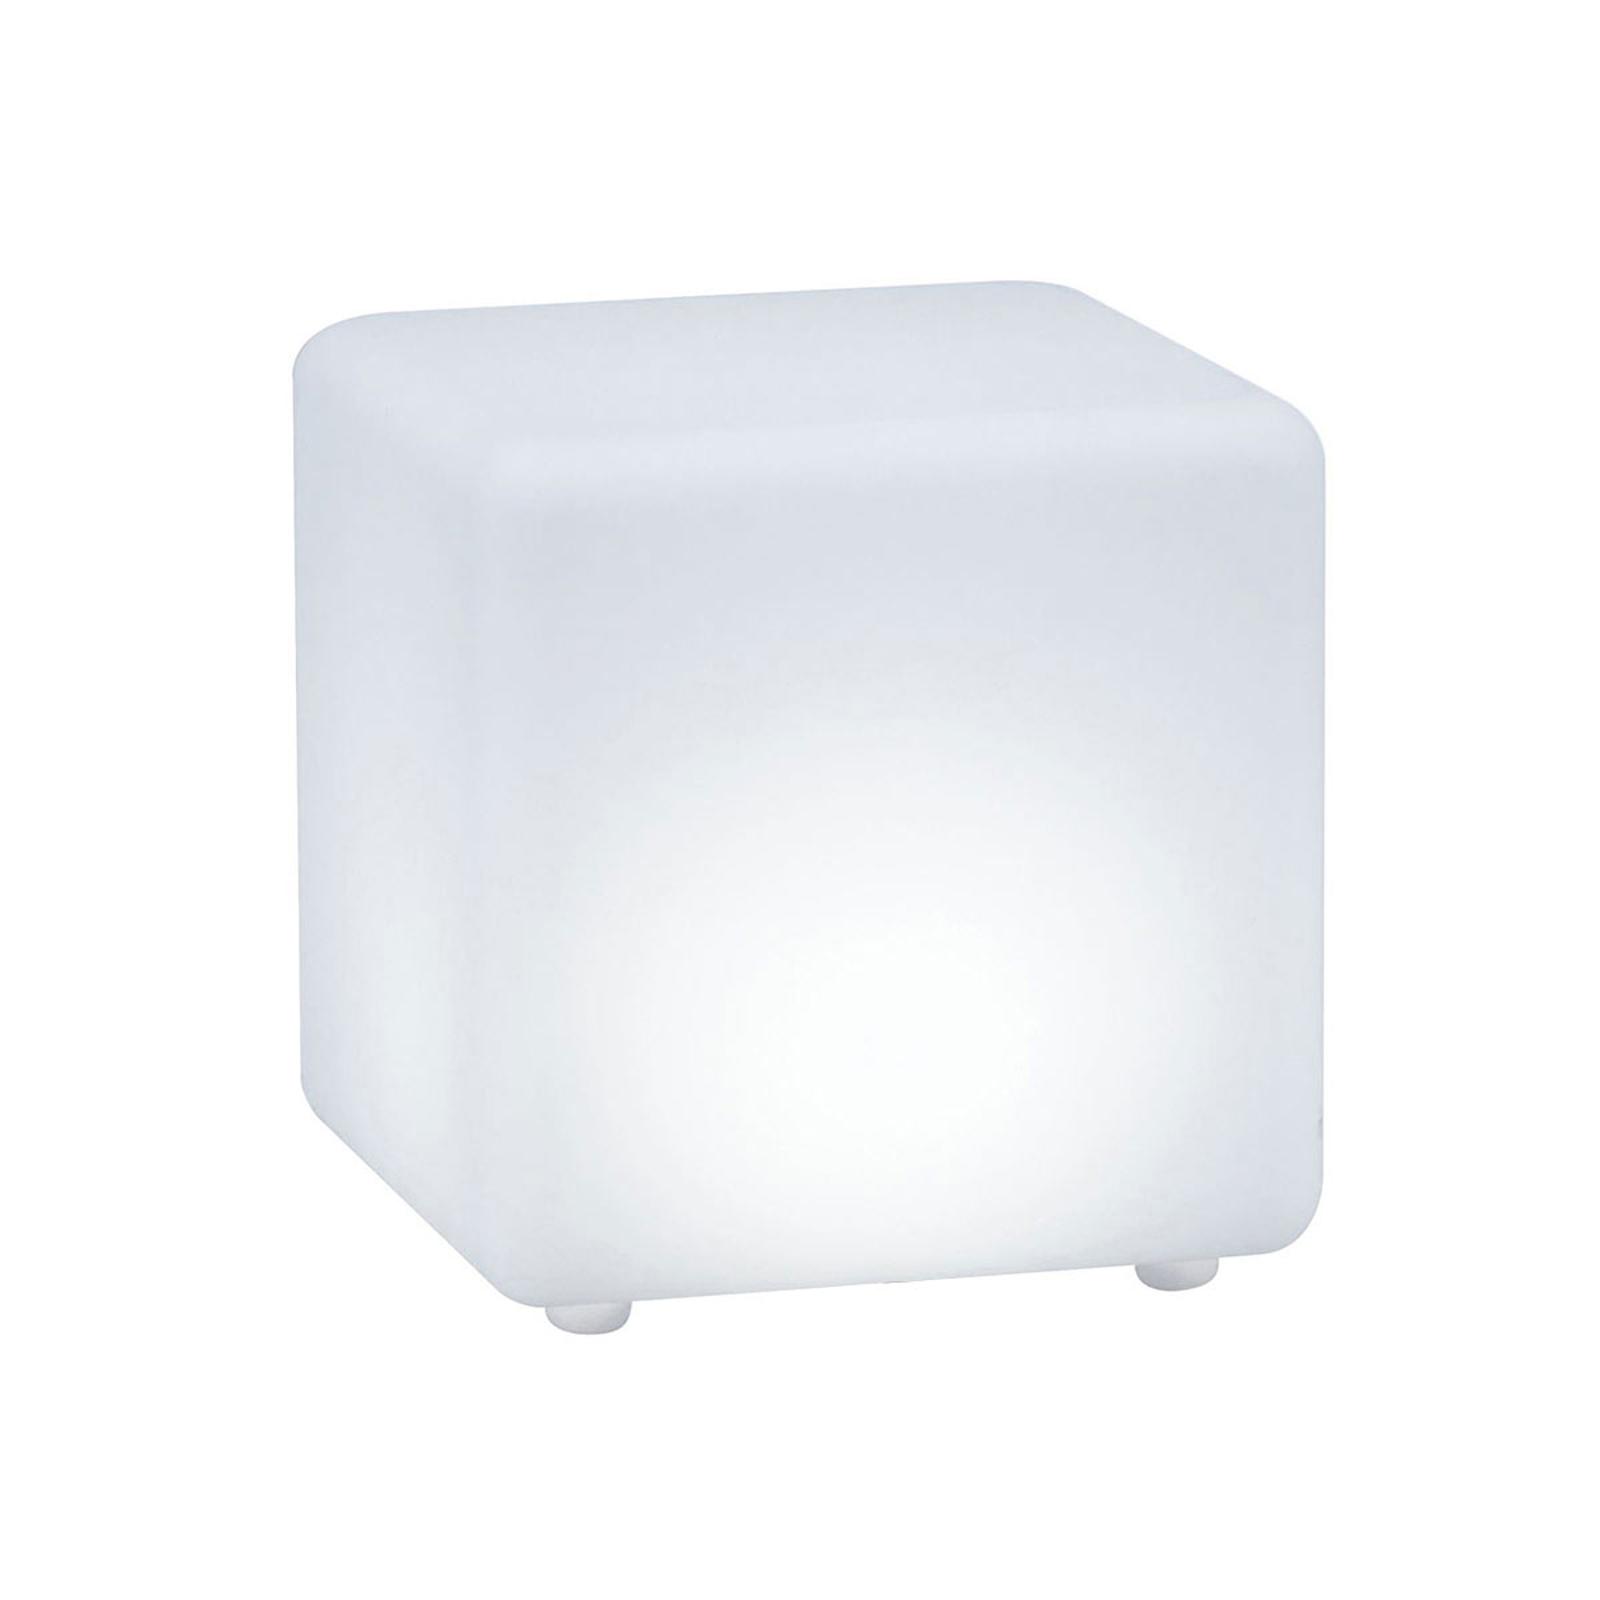 Paulmann Plug & Shine lampe déco Cube ZigBee, RGBW